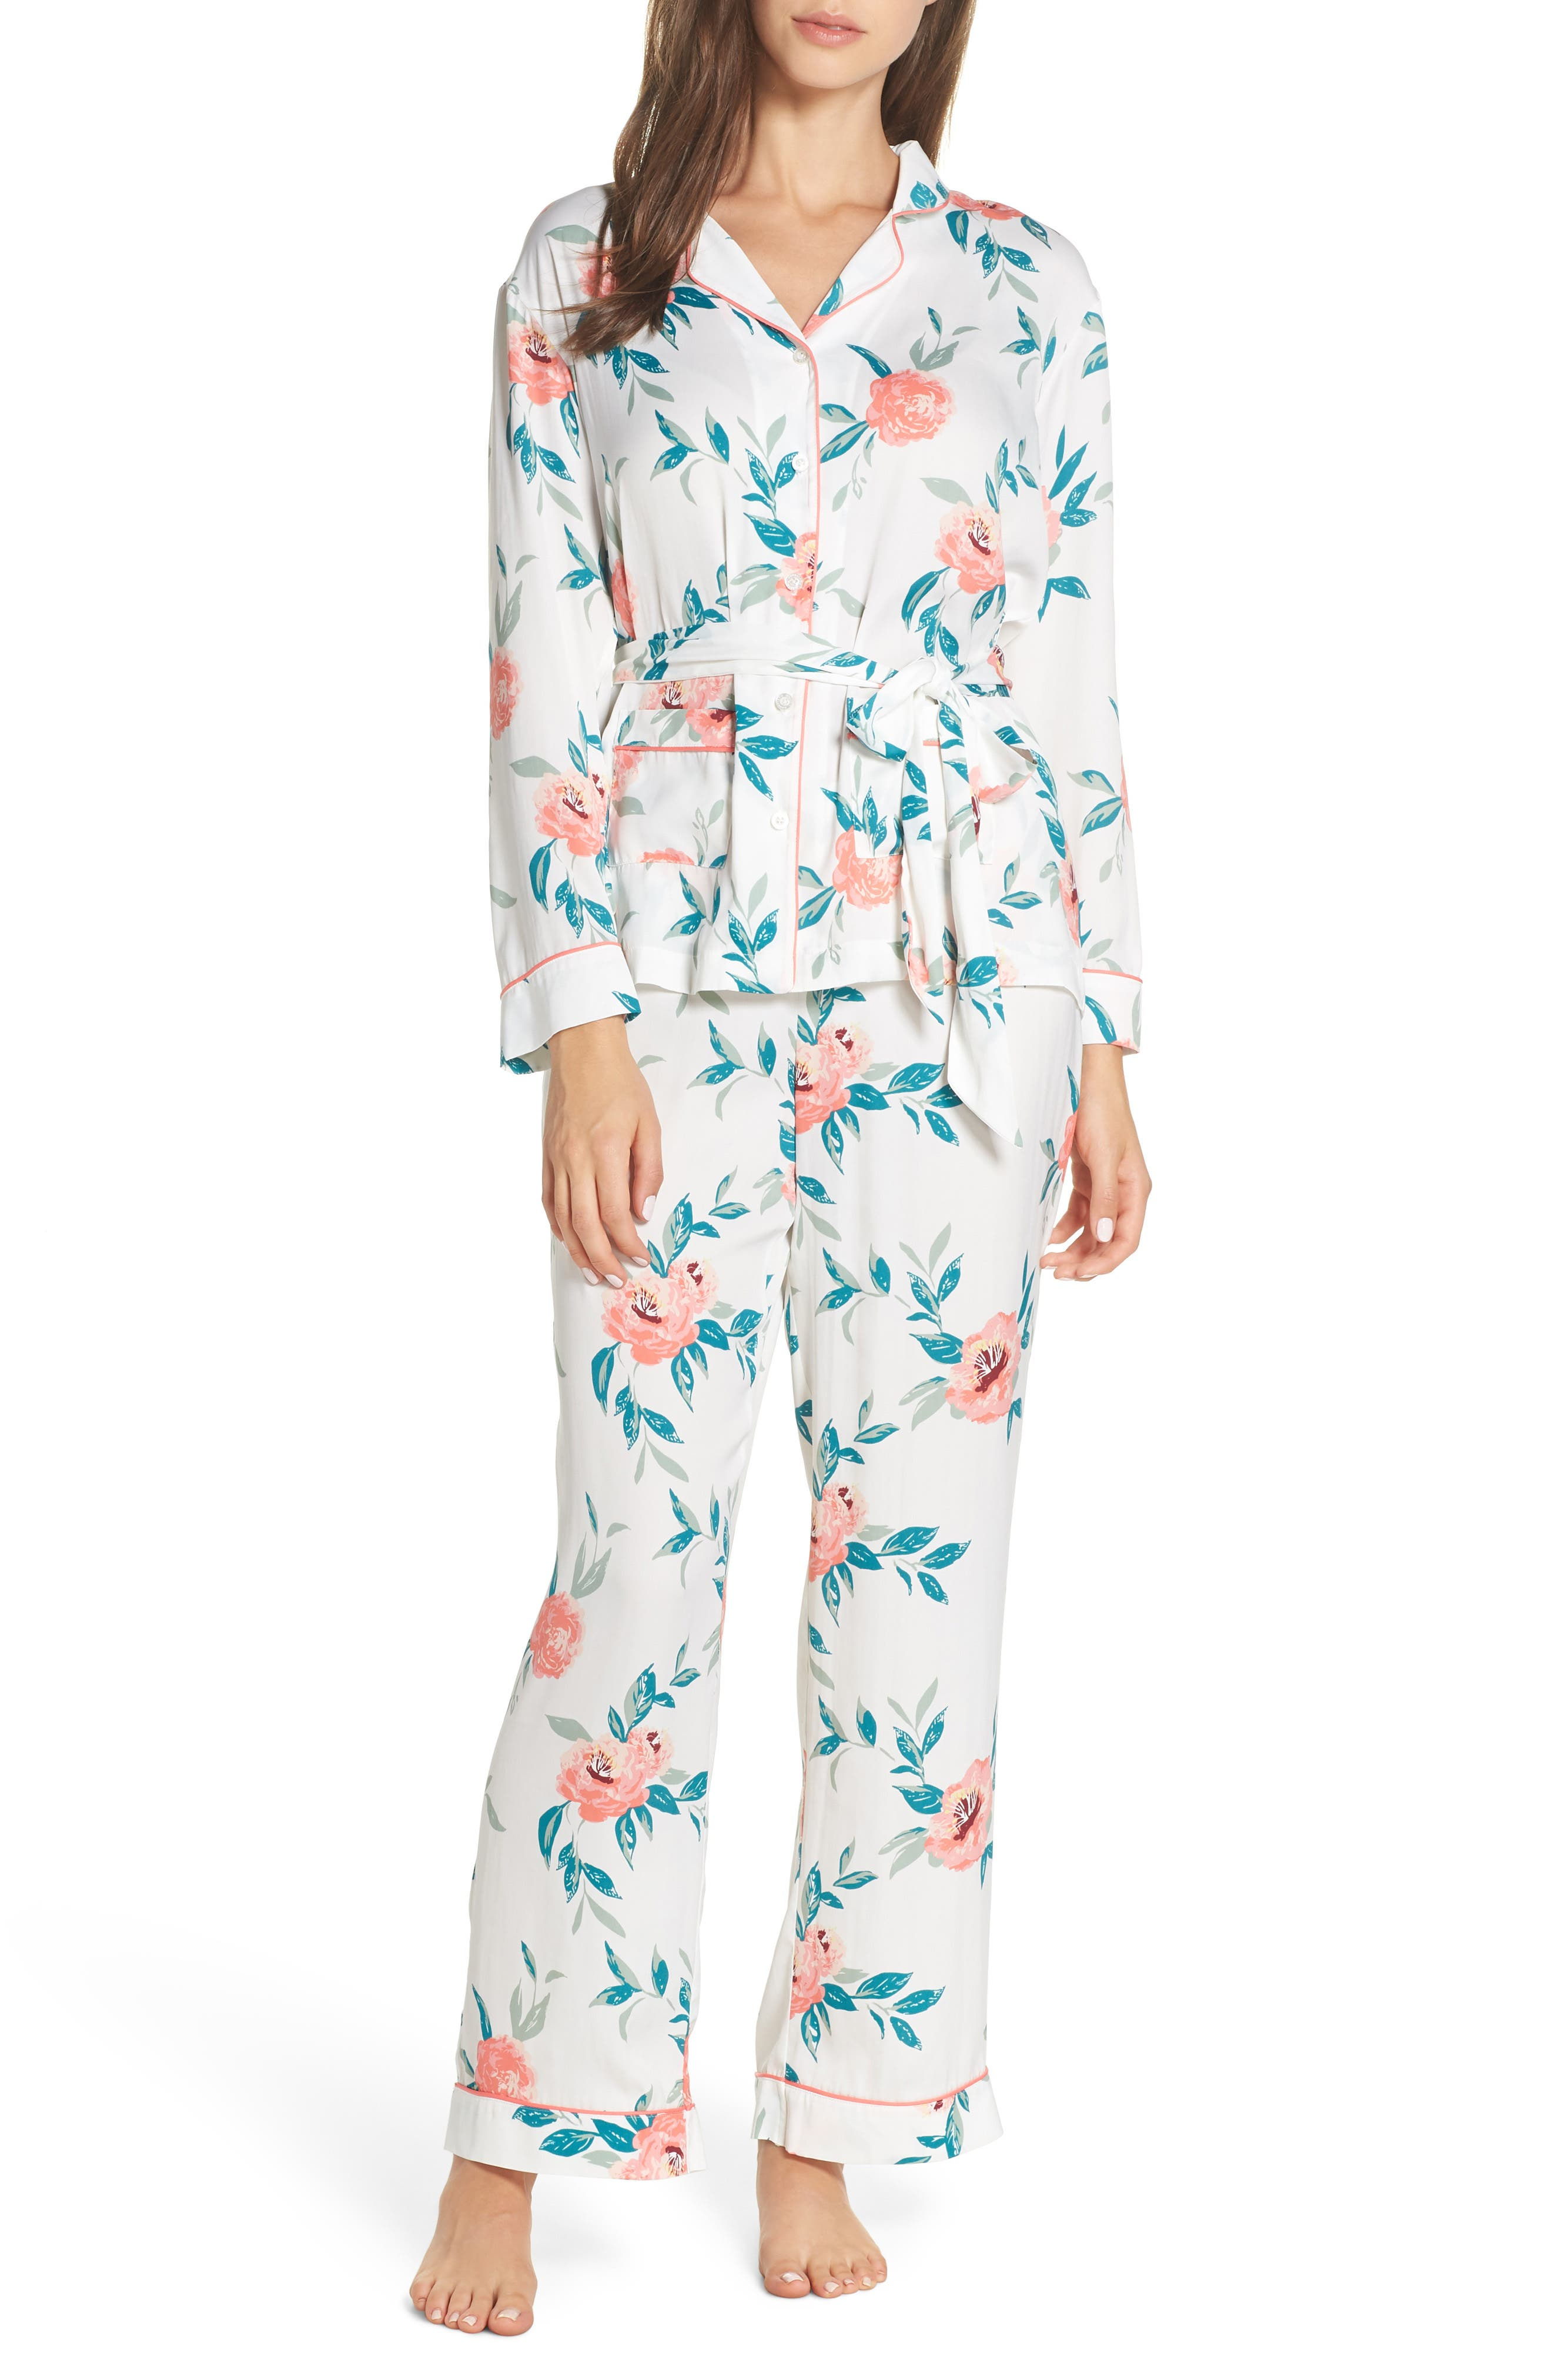 Sweet Dreams Wrap Pajamas,                             Main thumbnail 1, color,                             WHITE WINTER BLOOM